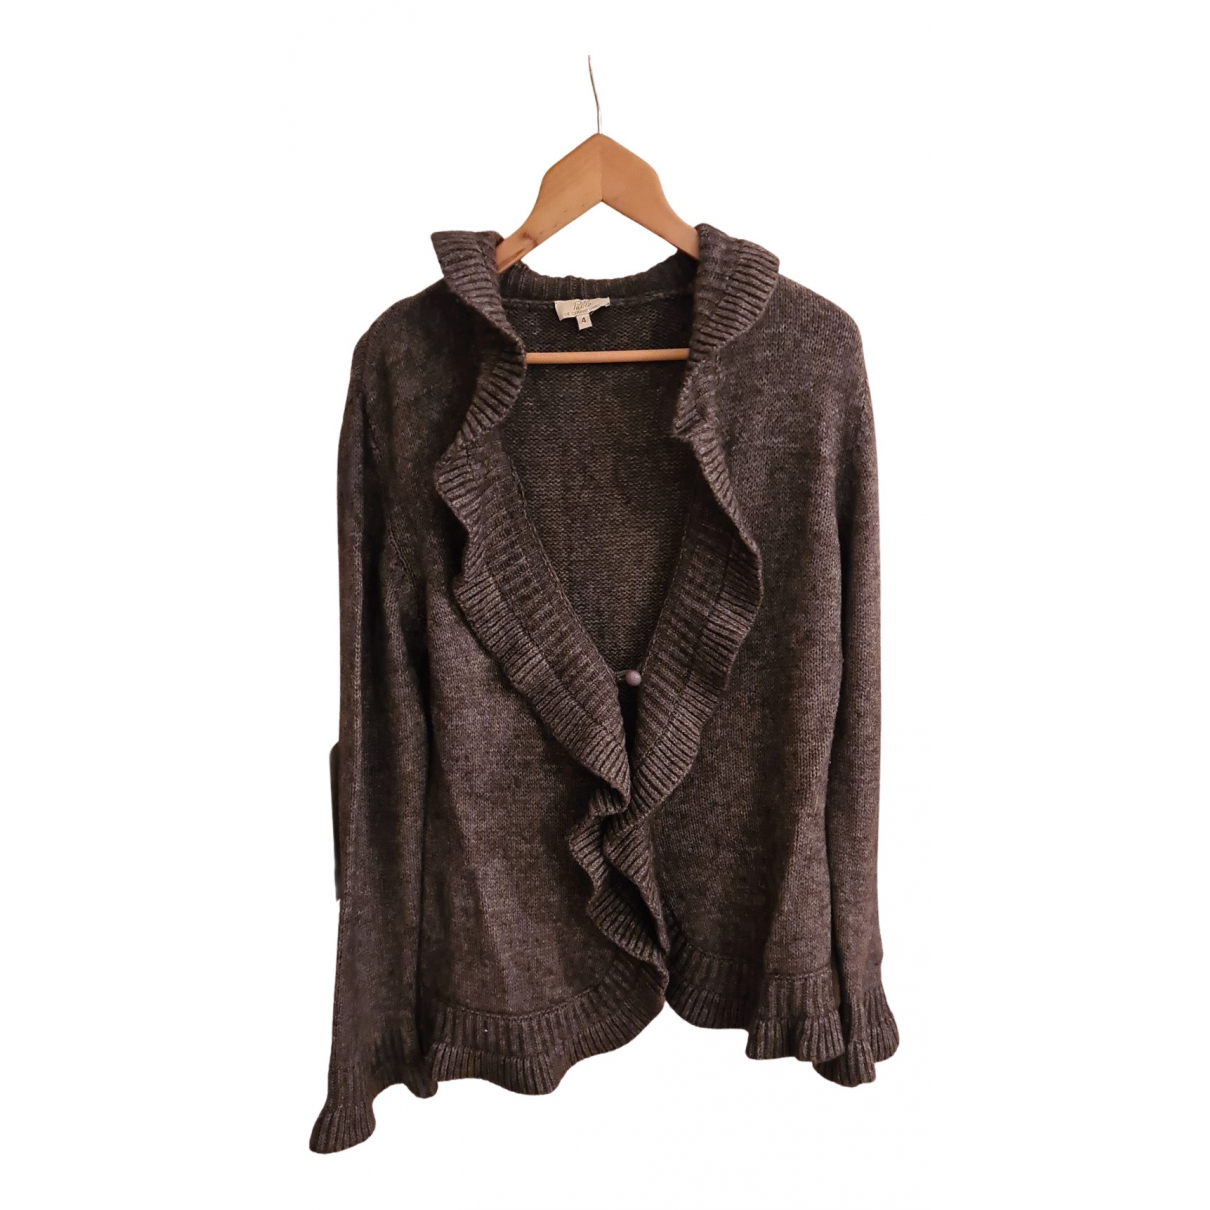 Gerard Darel N Grey Wool Knitwear for Women 4 0-5